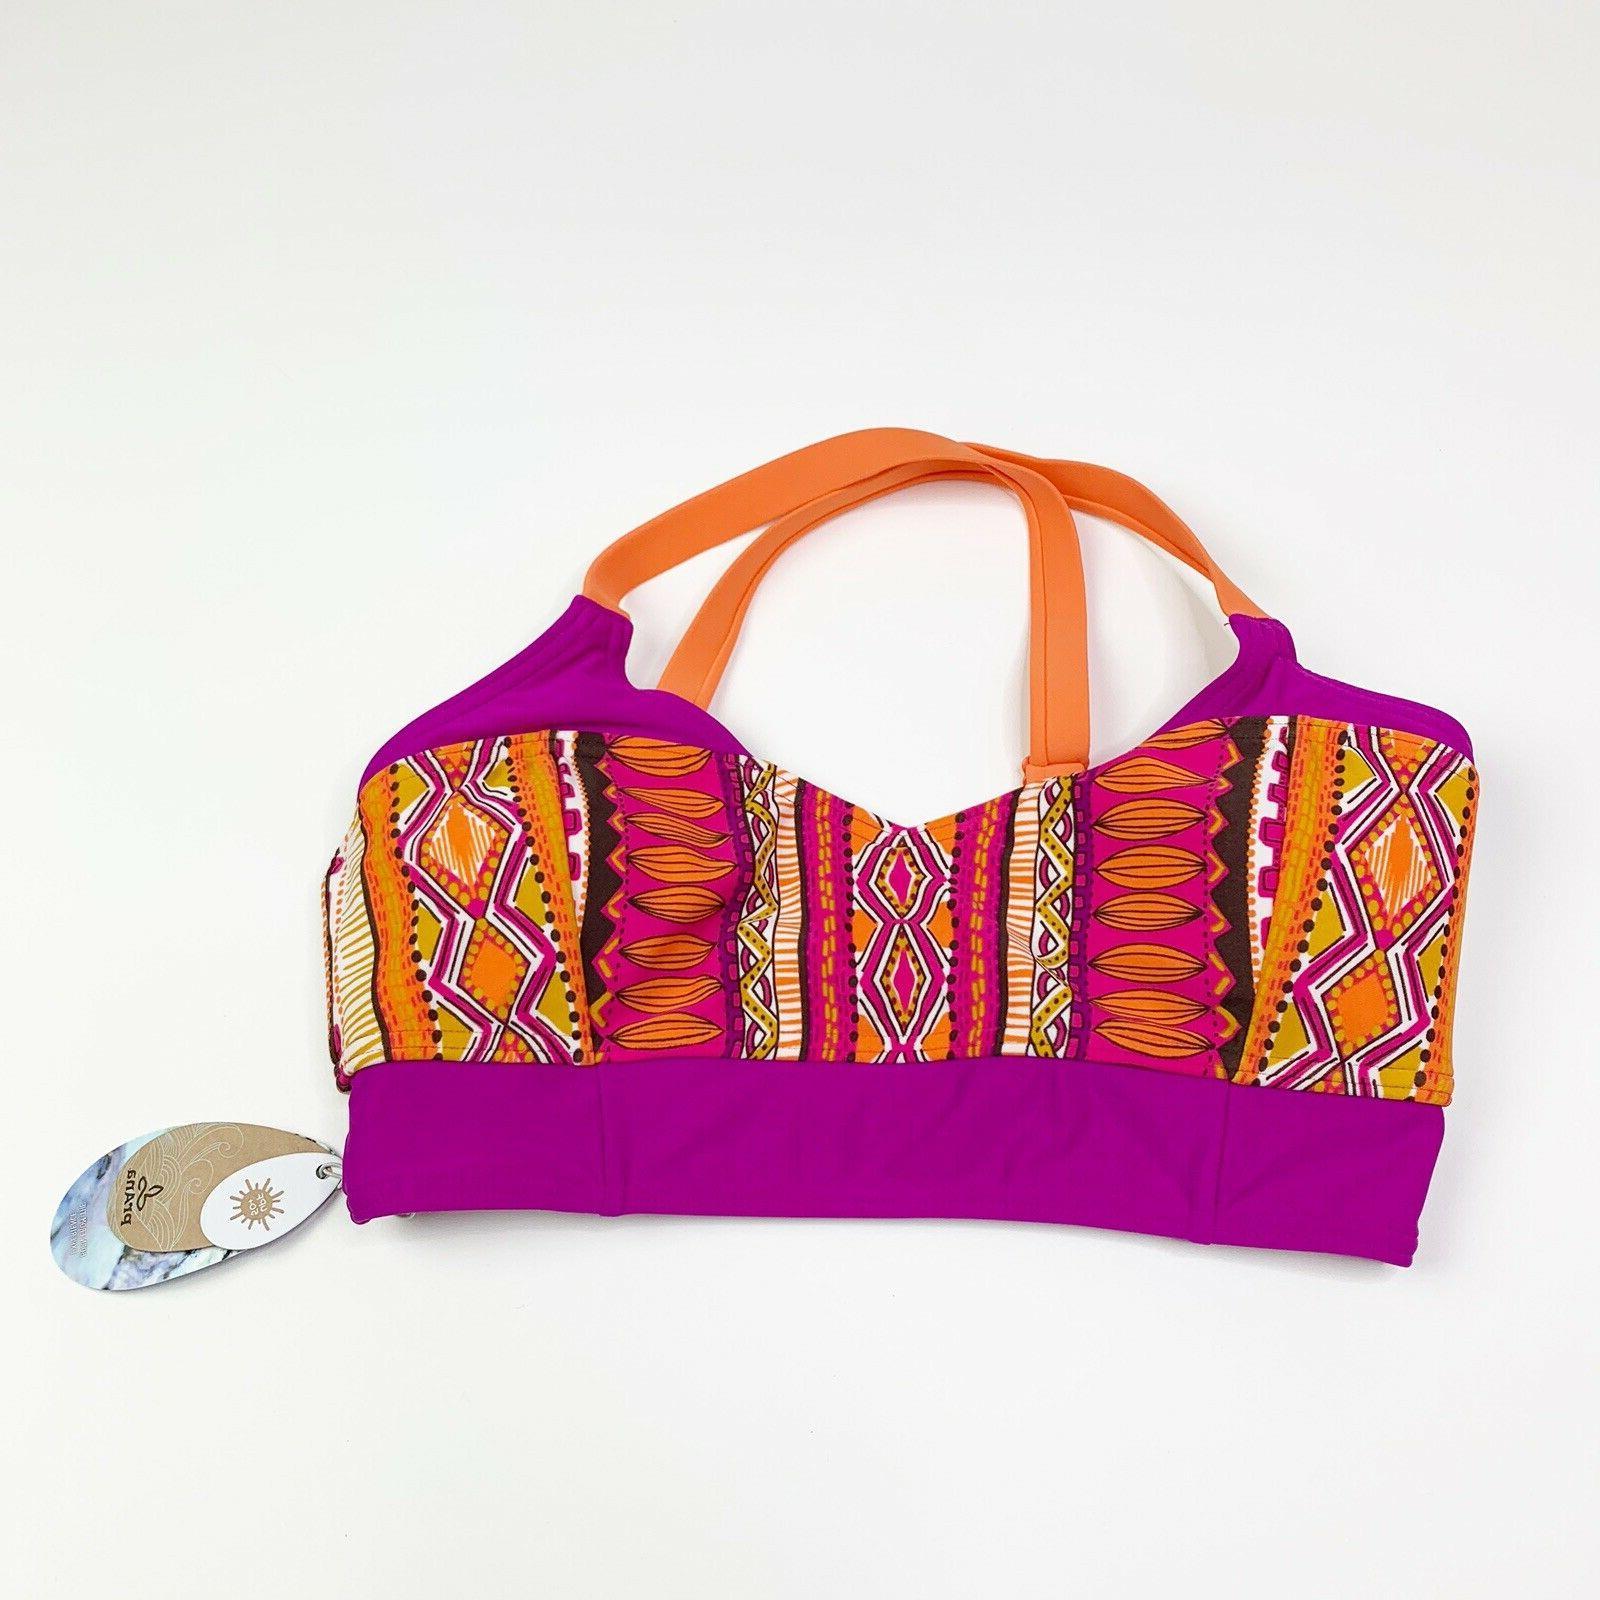 65 nwt multicolor vibrant liliana bathing suit